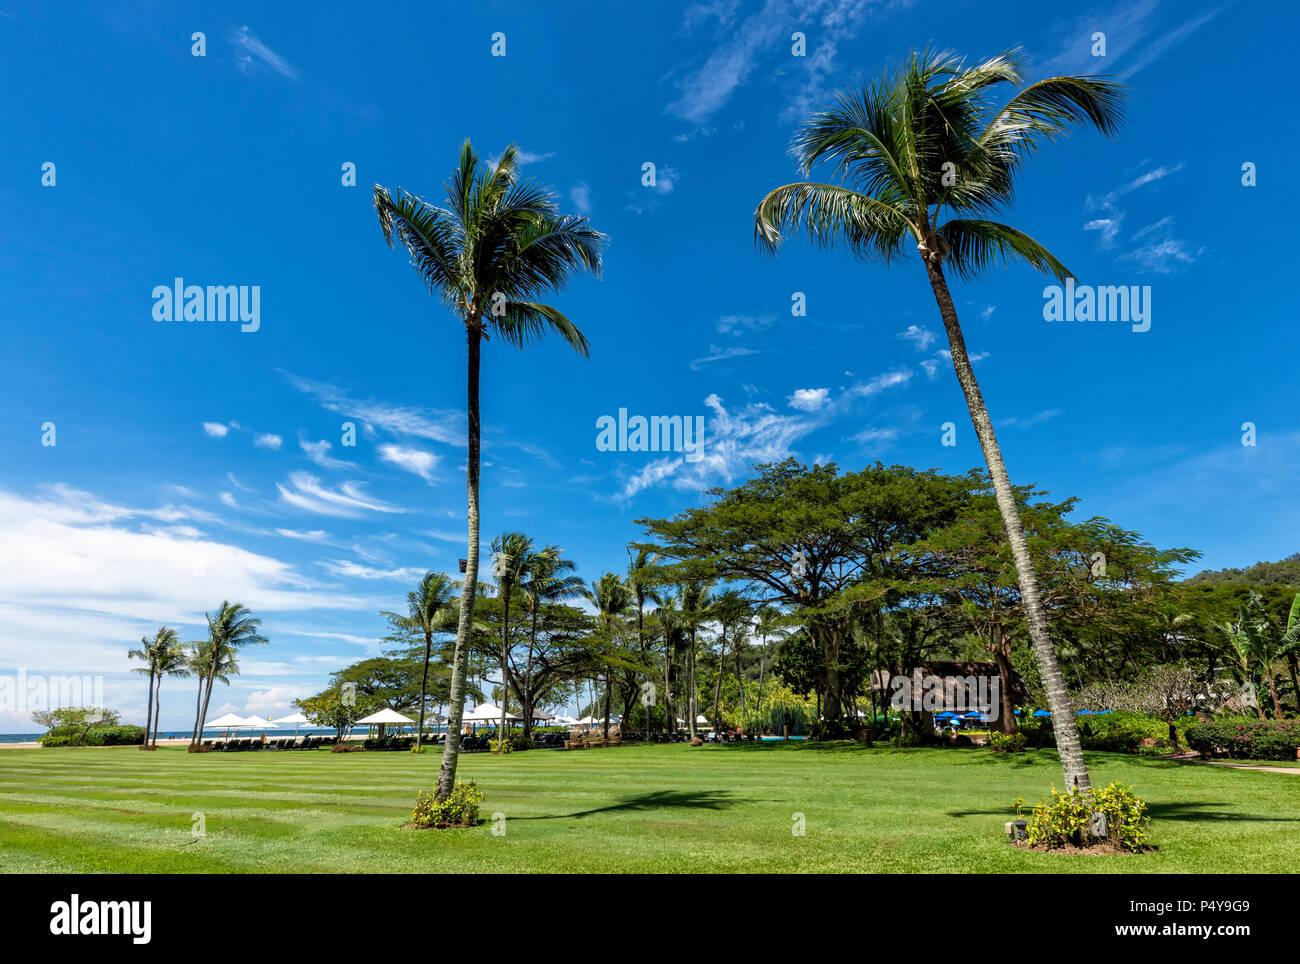 Las Palmeras contra un cielo azul en Kota Kinabalu en Borneo, Malasia Imagen De Stock